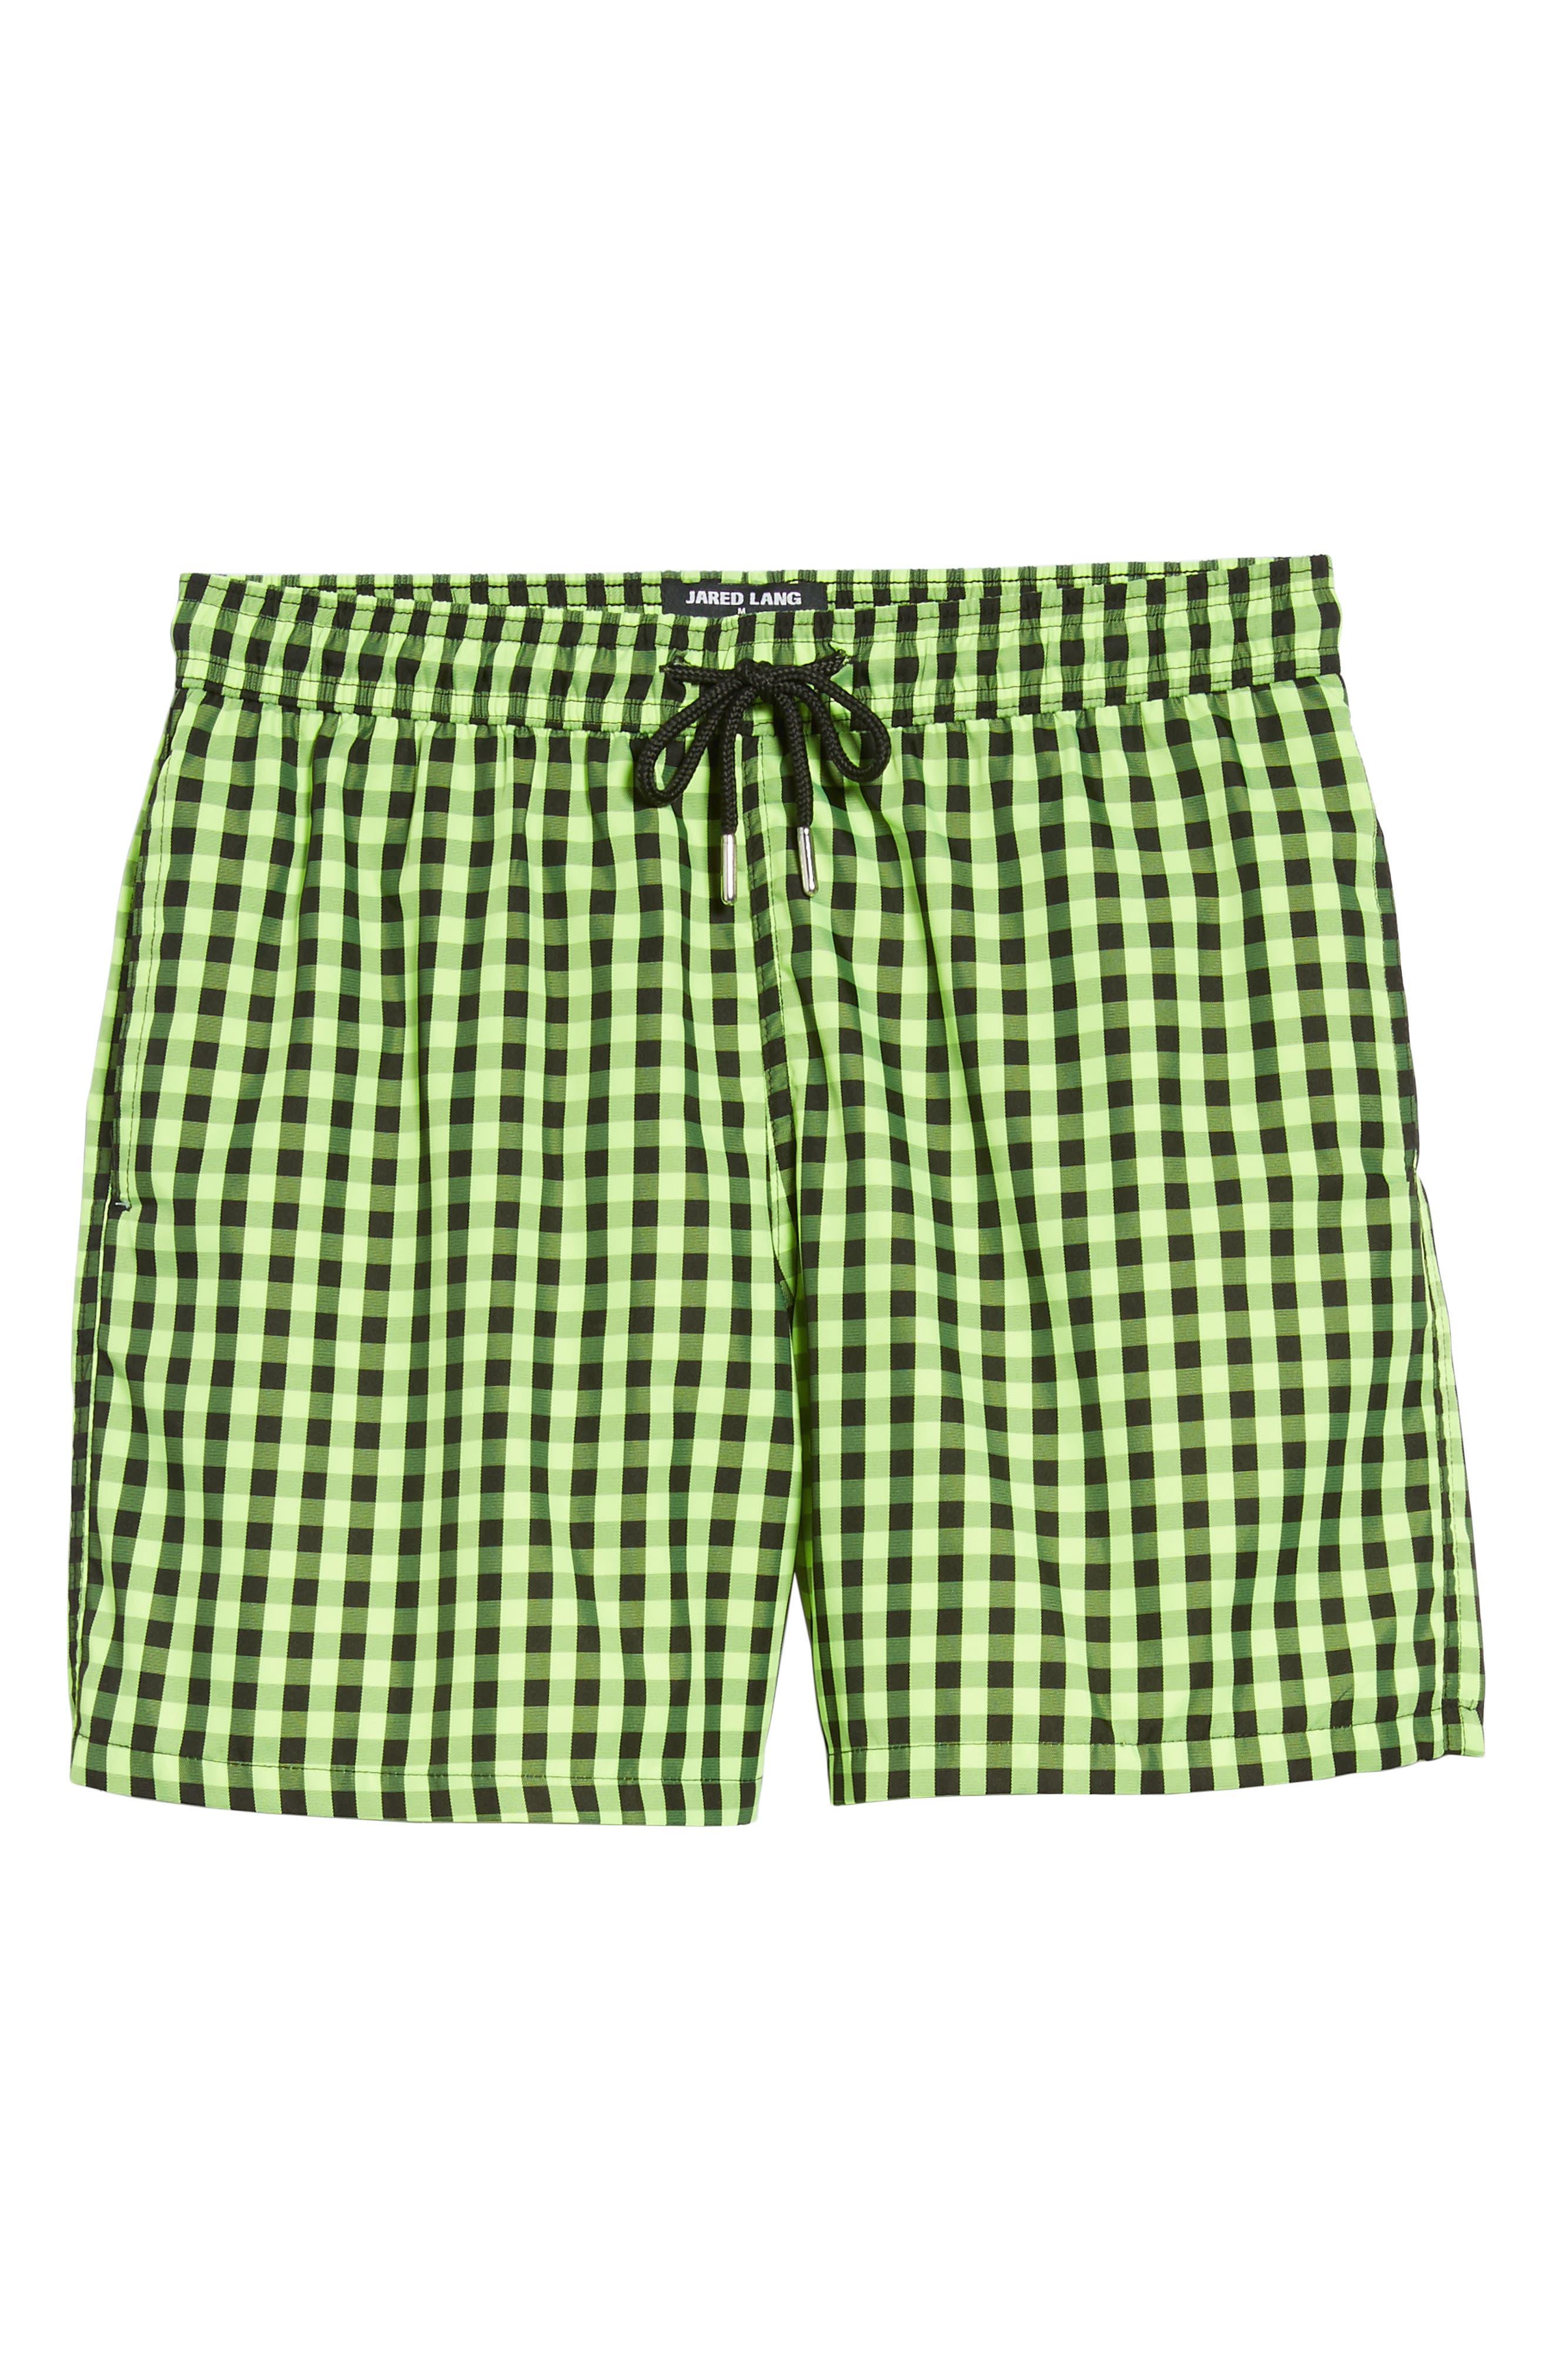 Trim Fit Swim Shorts,                             Alternate thumbnail 6, color,                             300